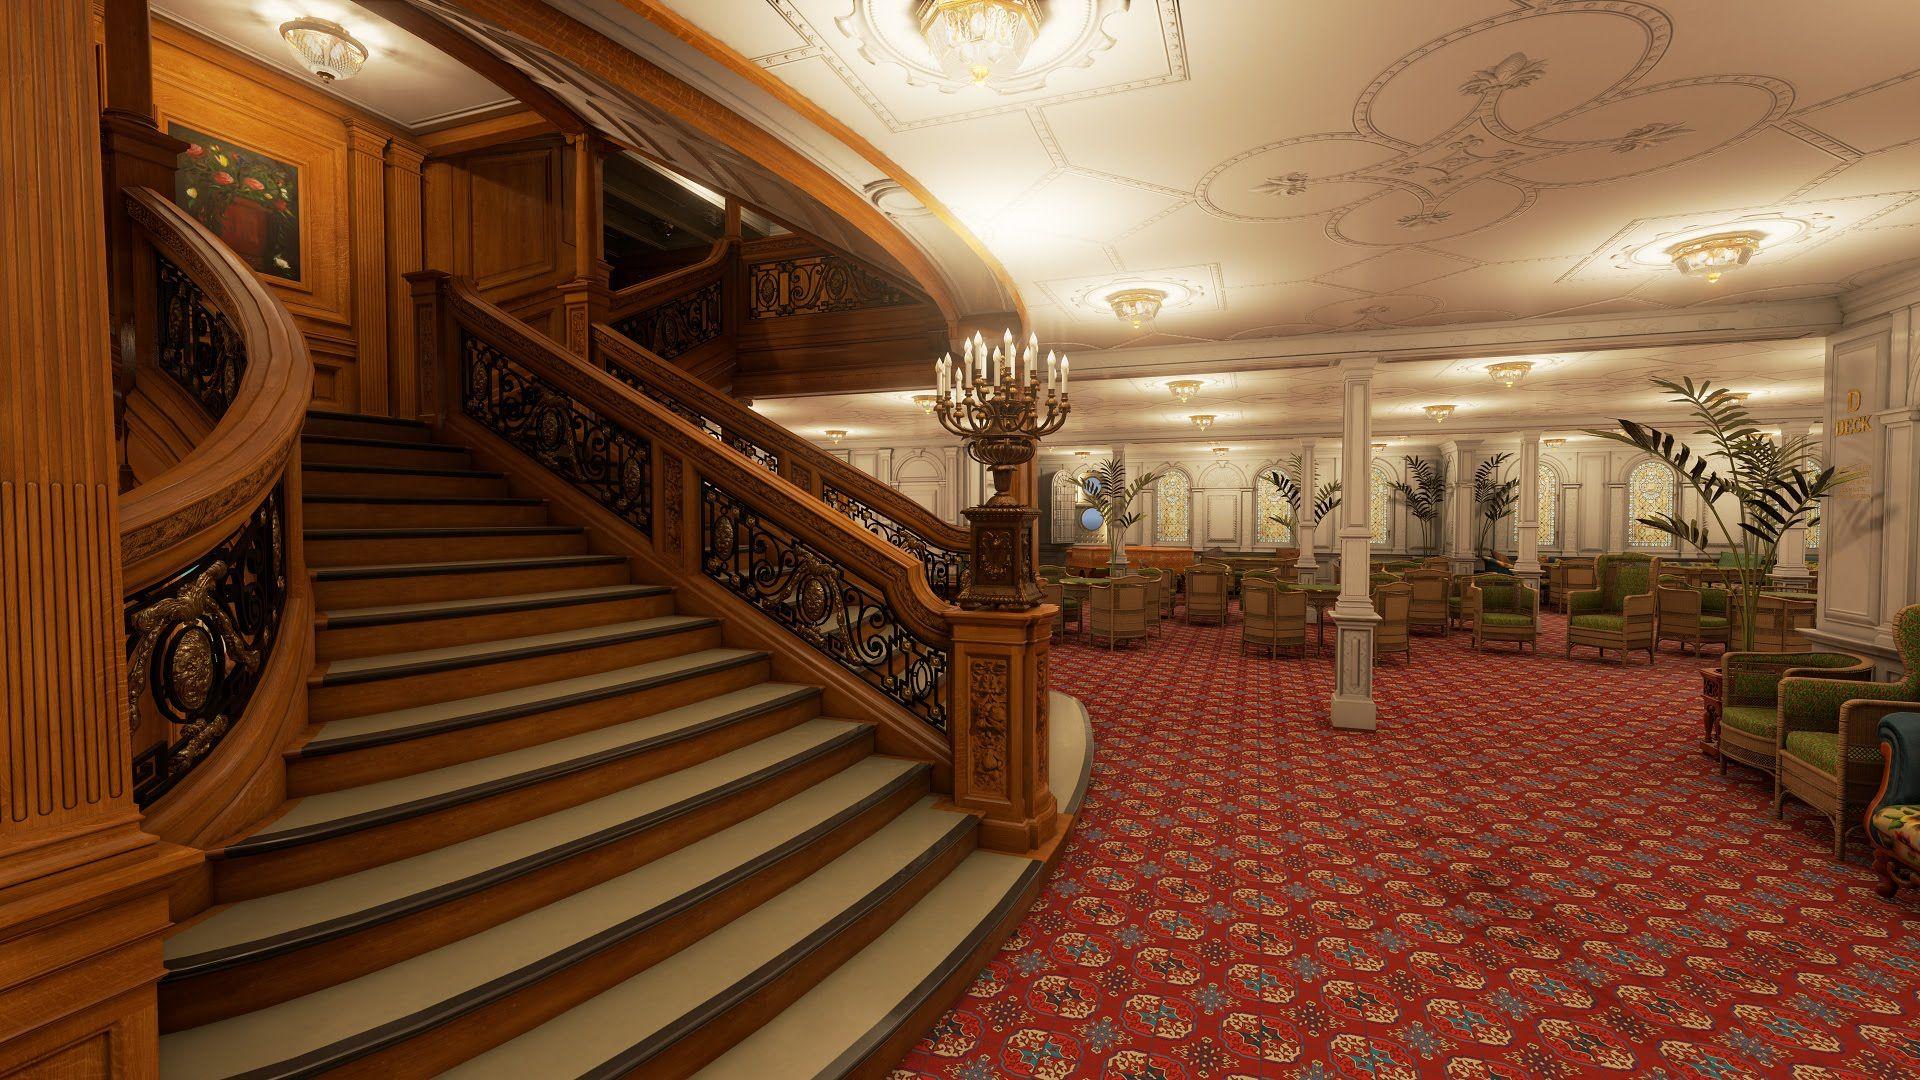 [ Unreal Engine 4 ] Titanic: Honor and Glory DEMO - GTX ...